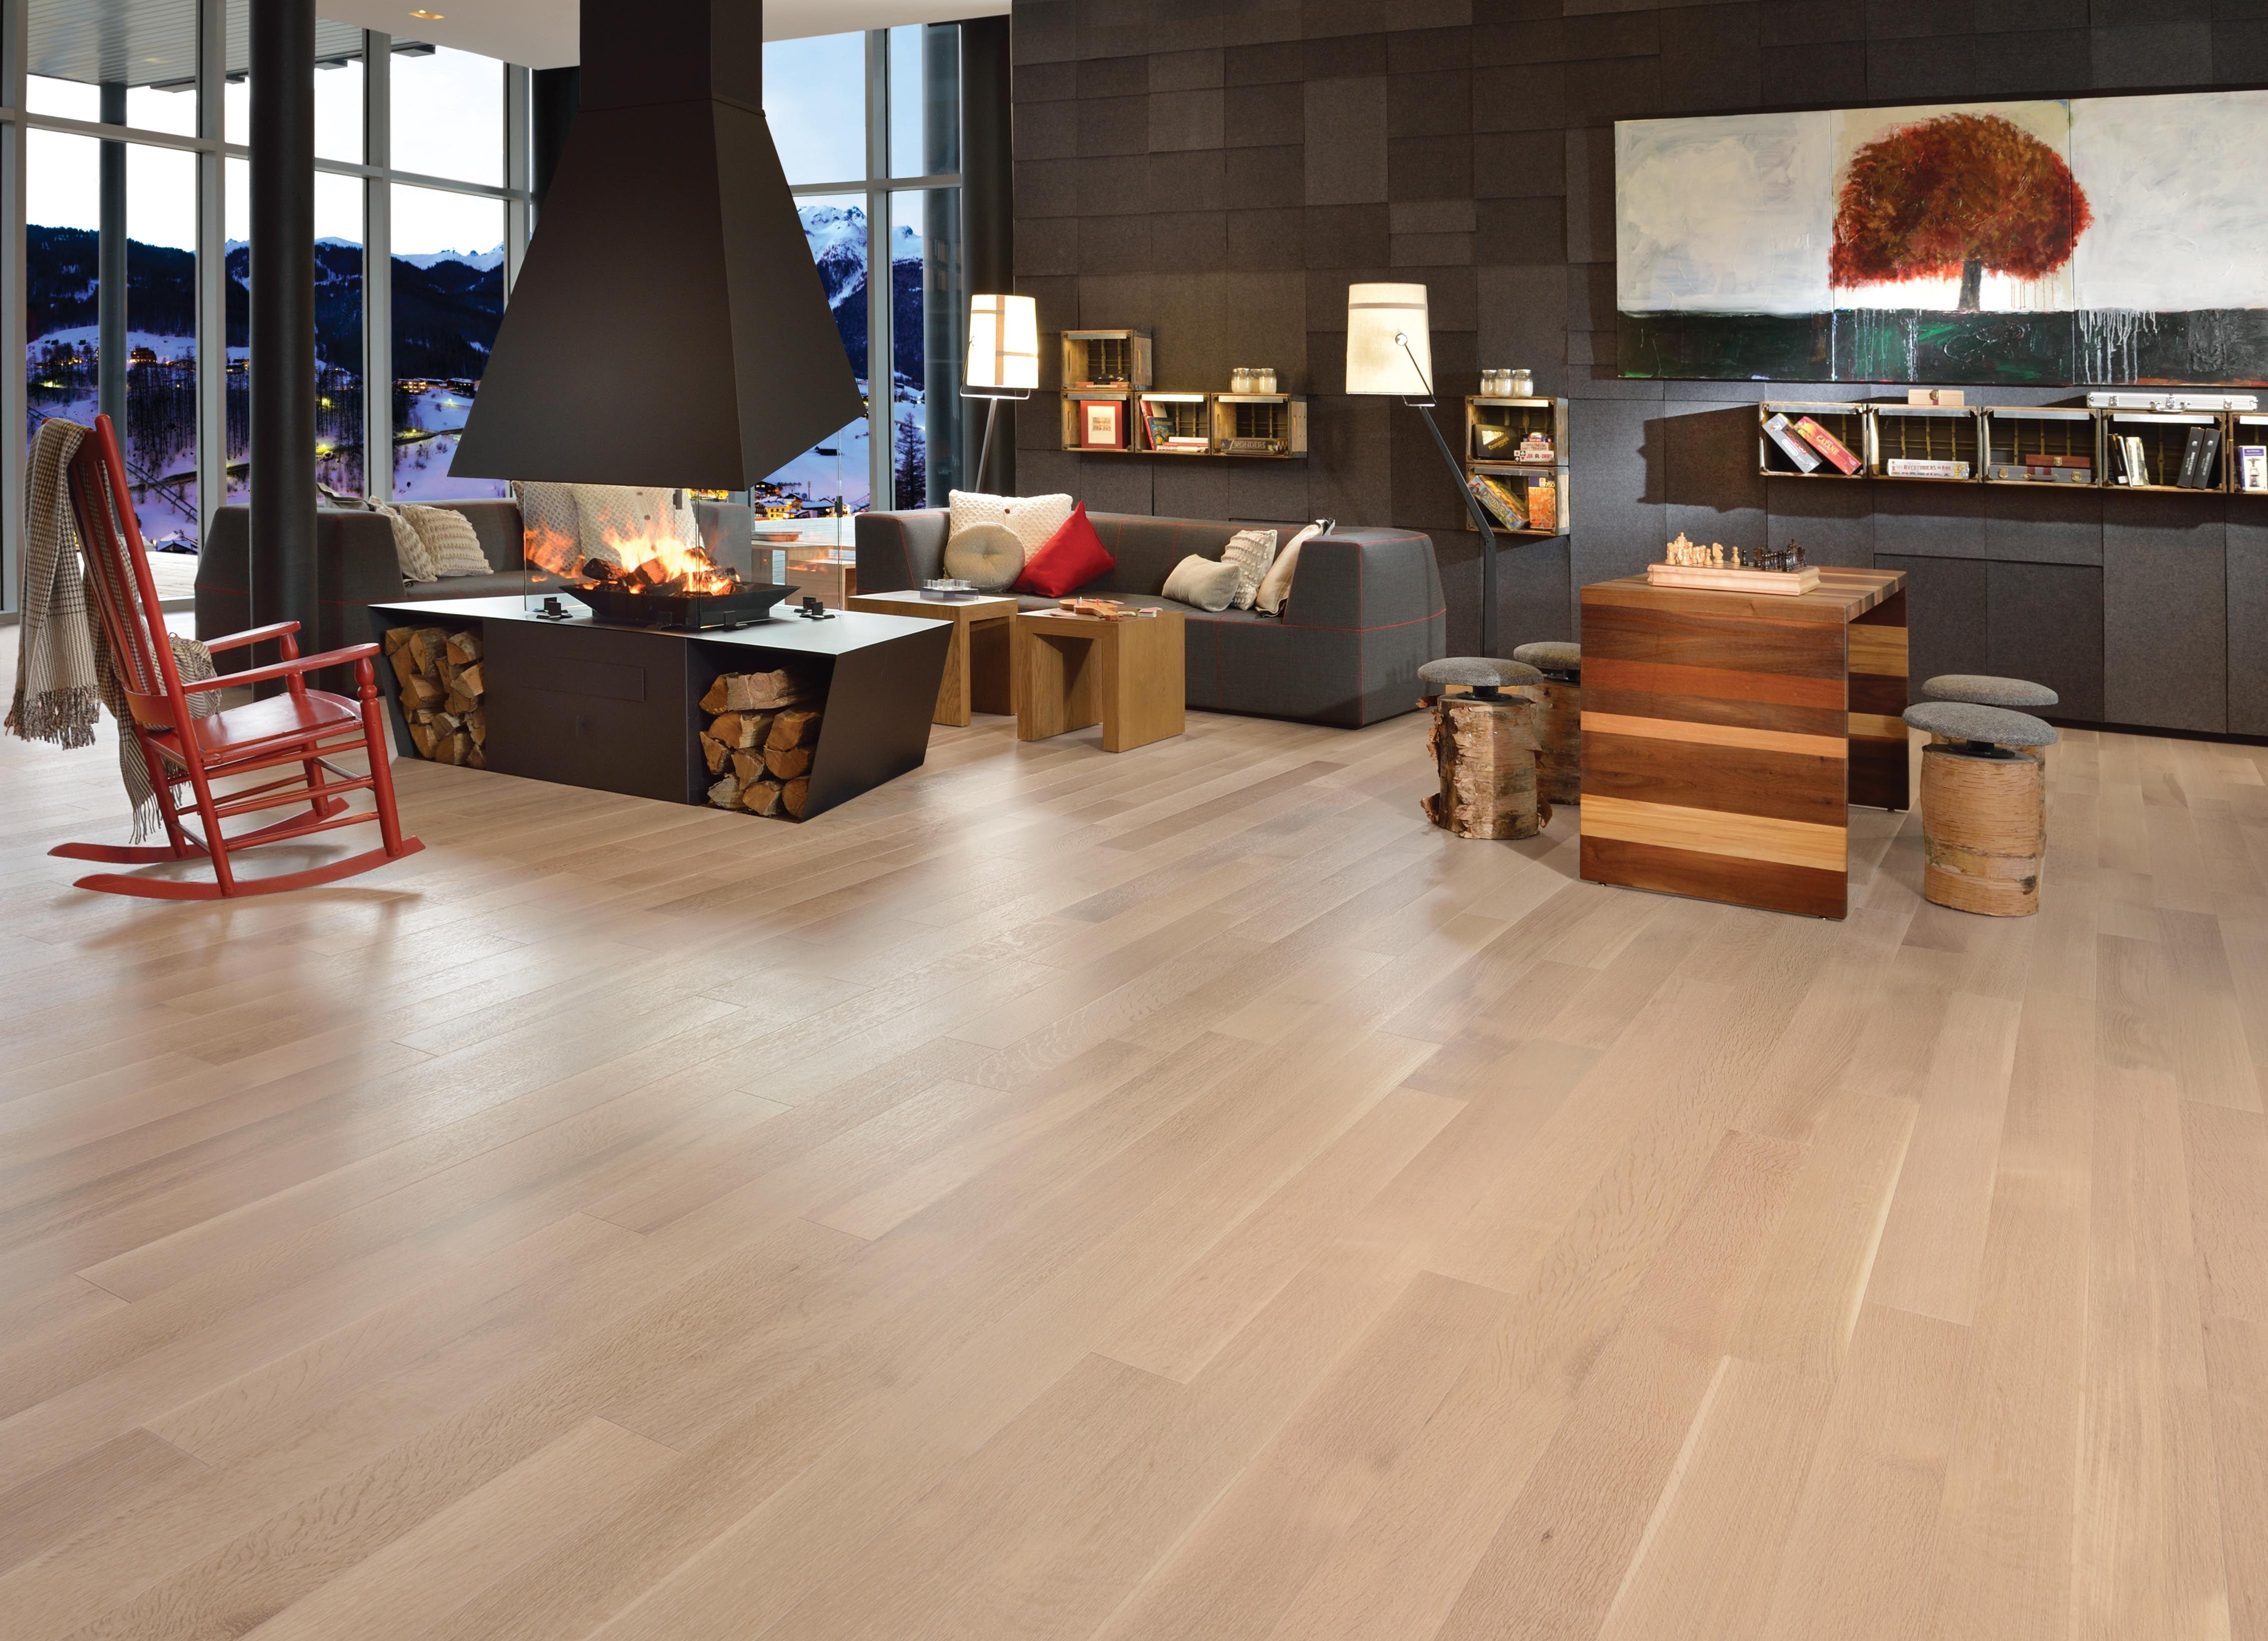 Alive White Oak R Amp Q Isla Mirage Hardwood Floors